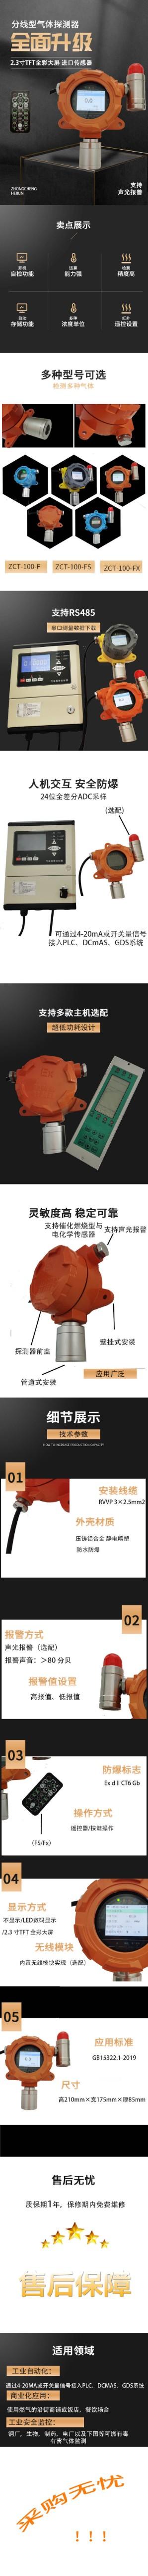 1ZCT-100f01(红).jpg